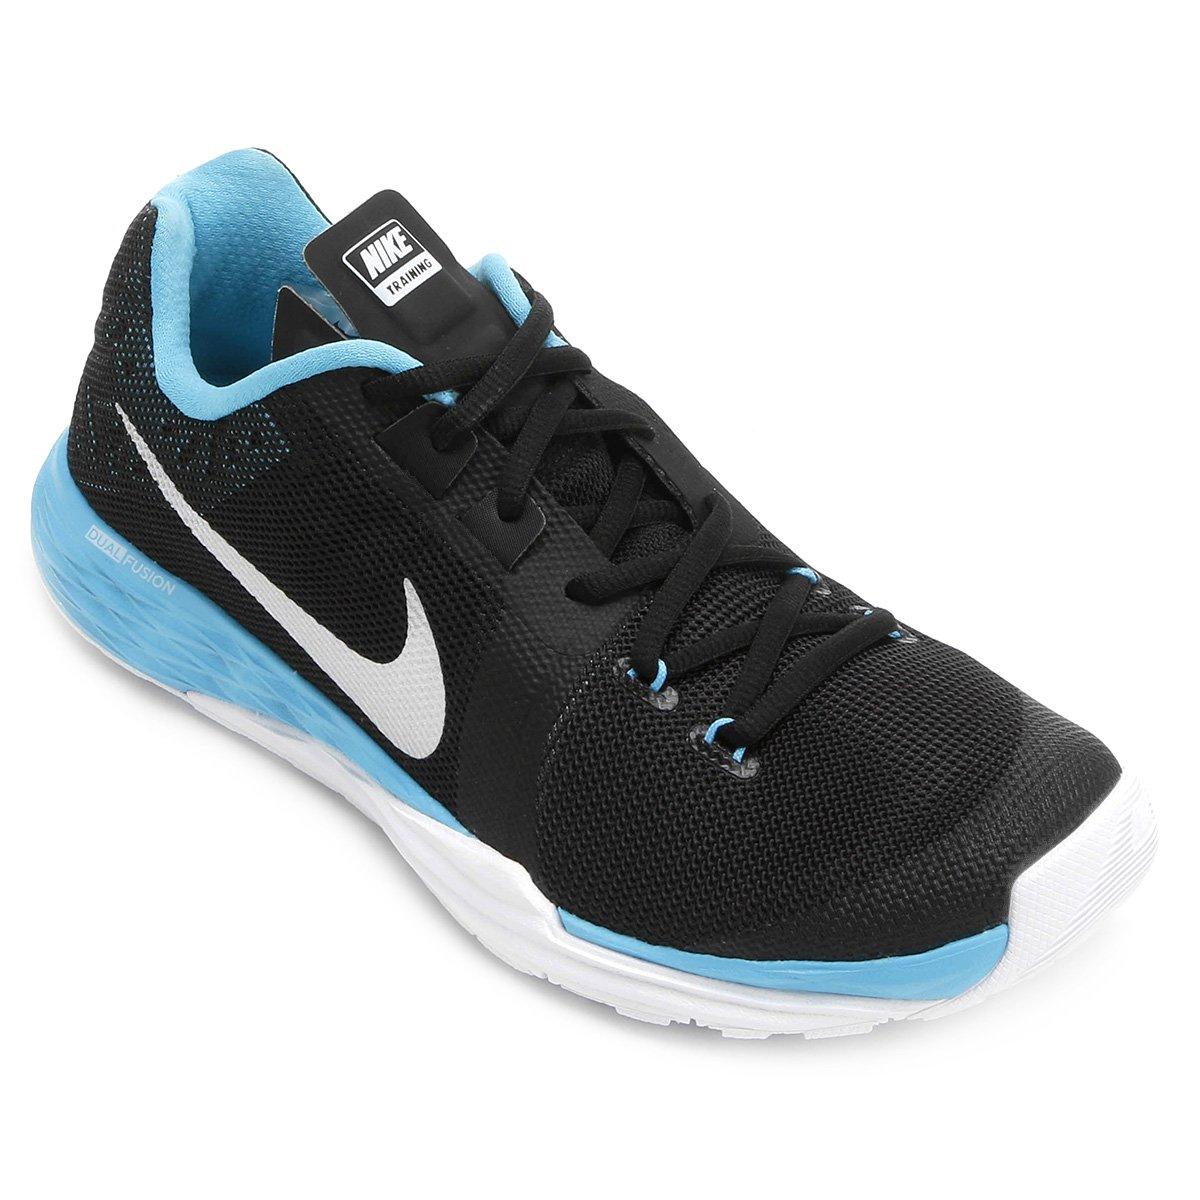 3bccdb20dbe Tênis Nike Train Prime Iron DF Masculino - Compre Agora